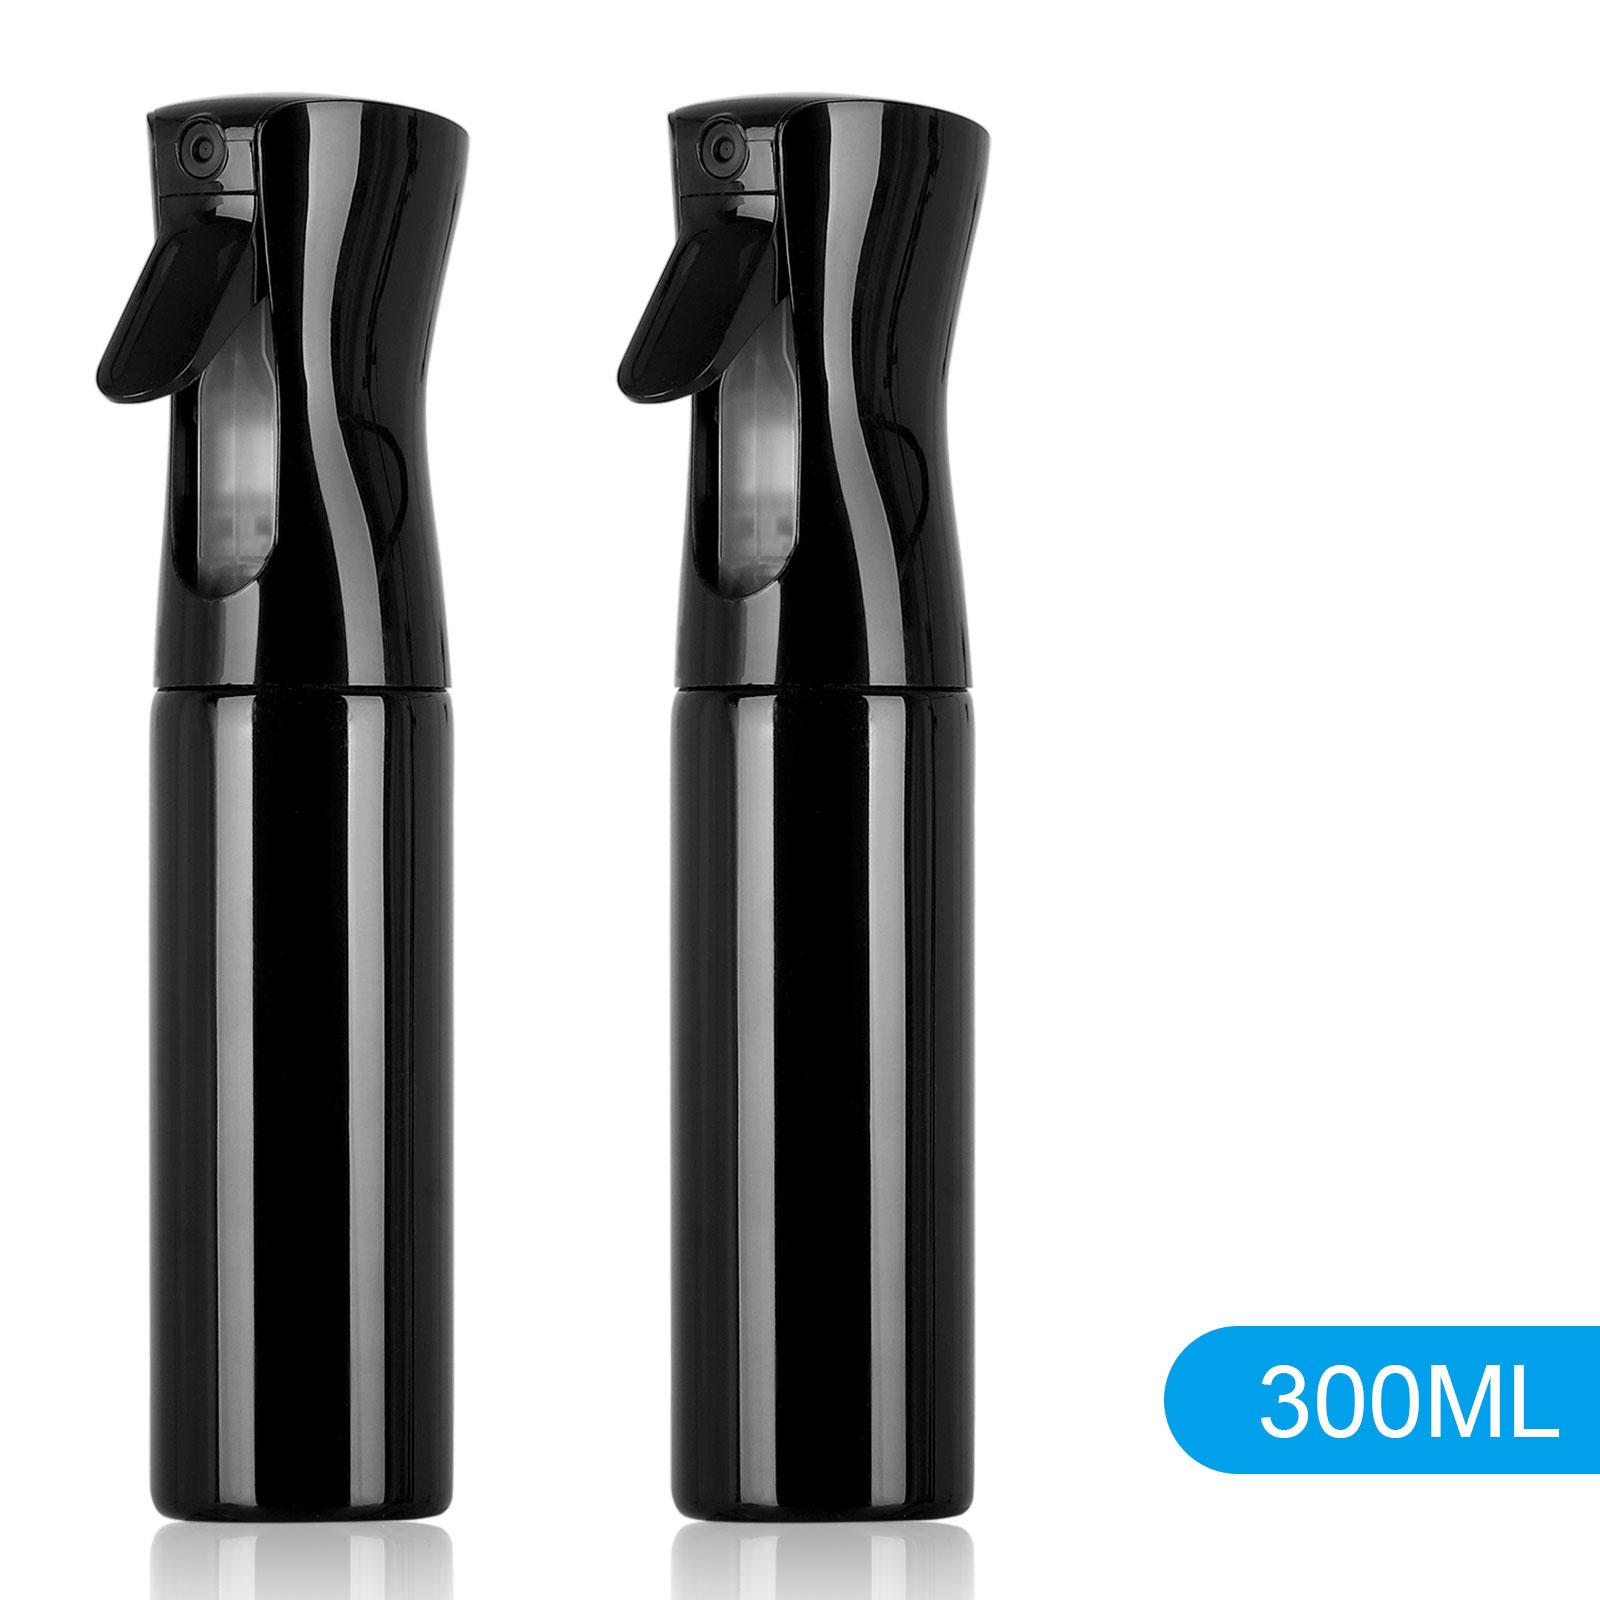 300ml-Hair-Fine-Mist-Spray-Water-Bottle-Sprayer-Hairdressing-Salon-Beauty-Tools thumbnail 16